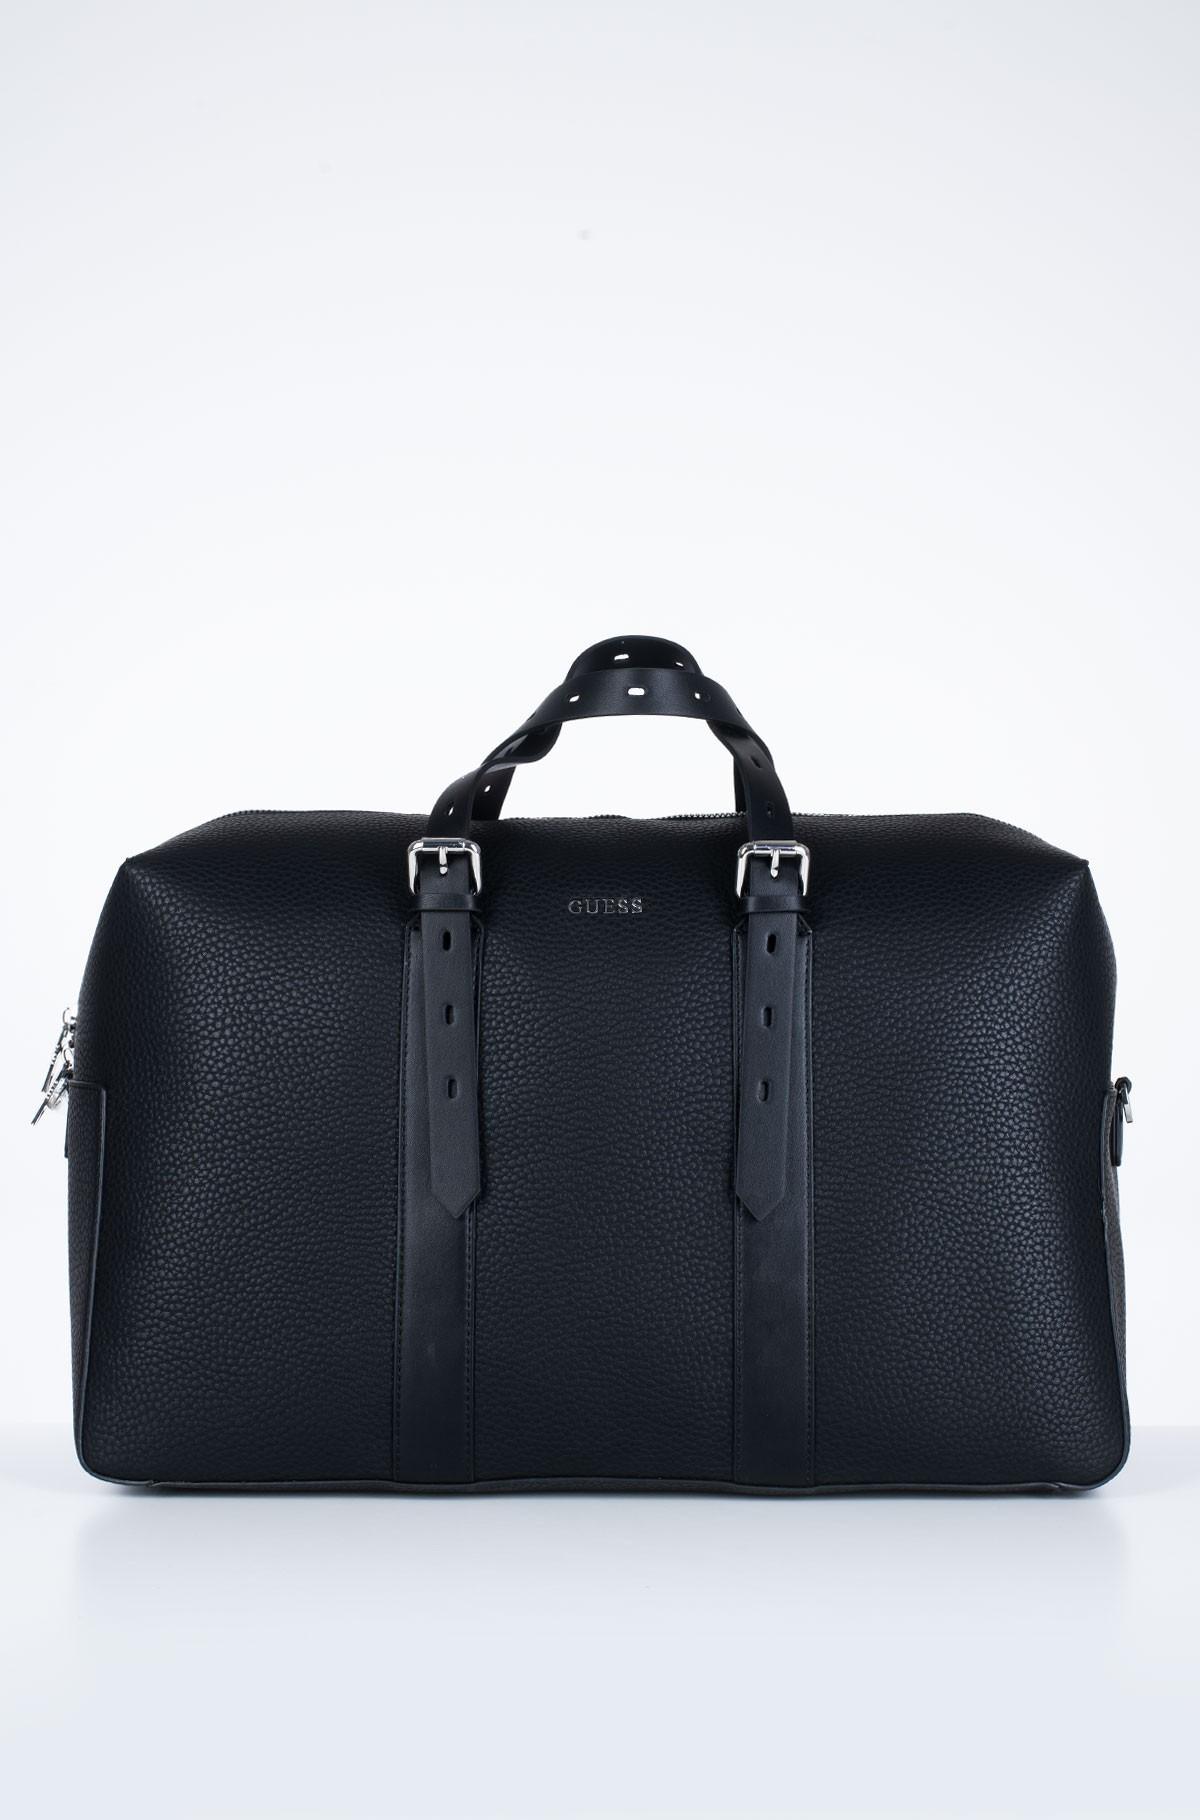 Kelionių krepšys TMDANP P0235-full-1